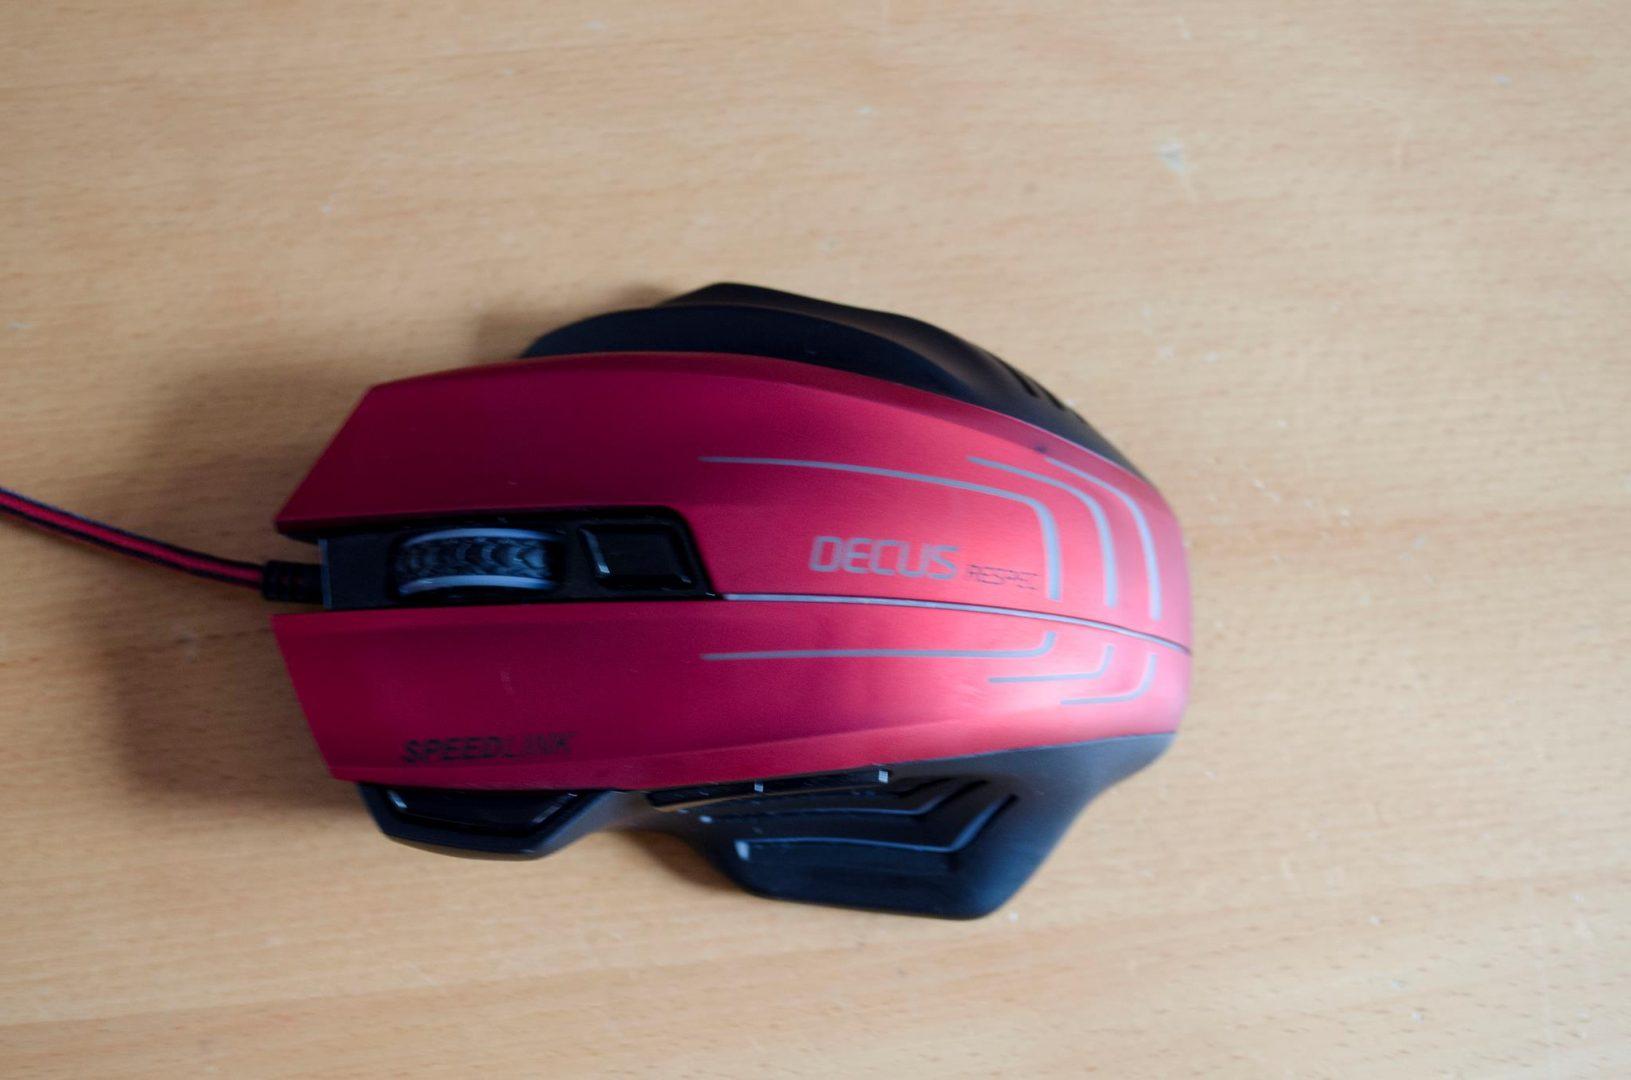 speedlink decus respec gaming mouse review_3